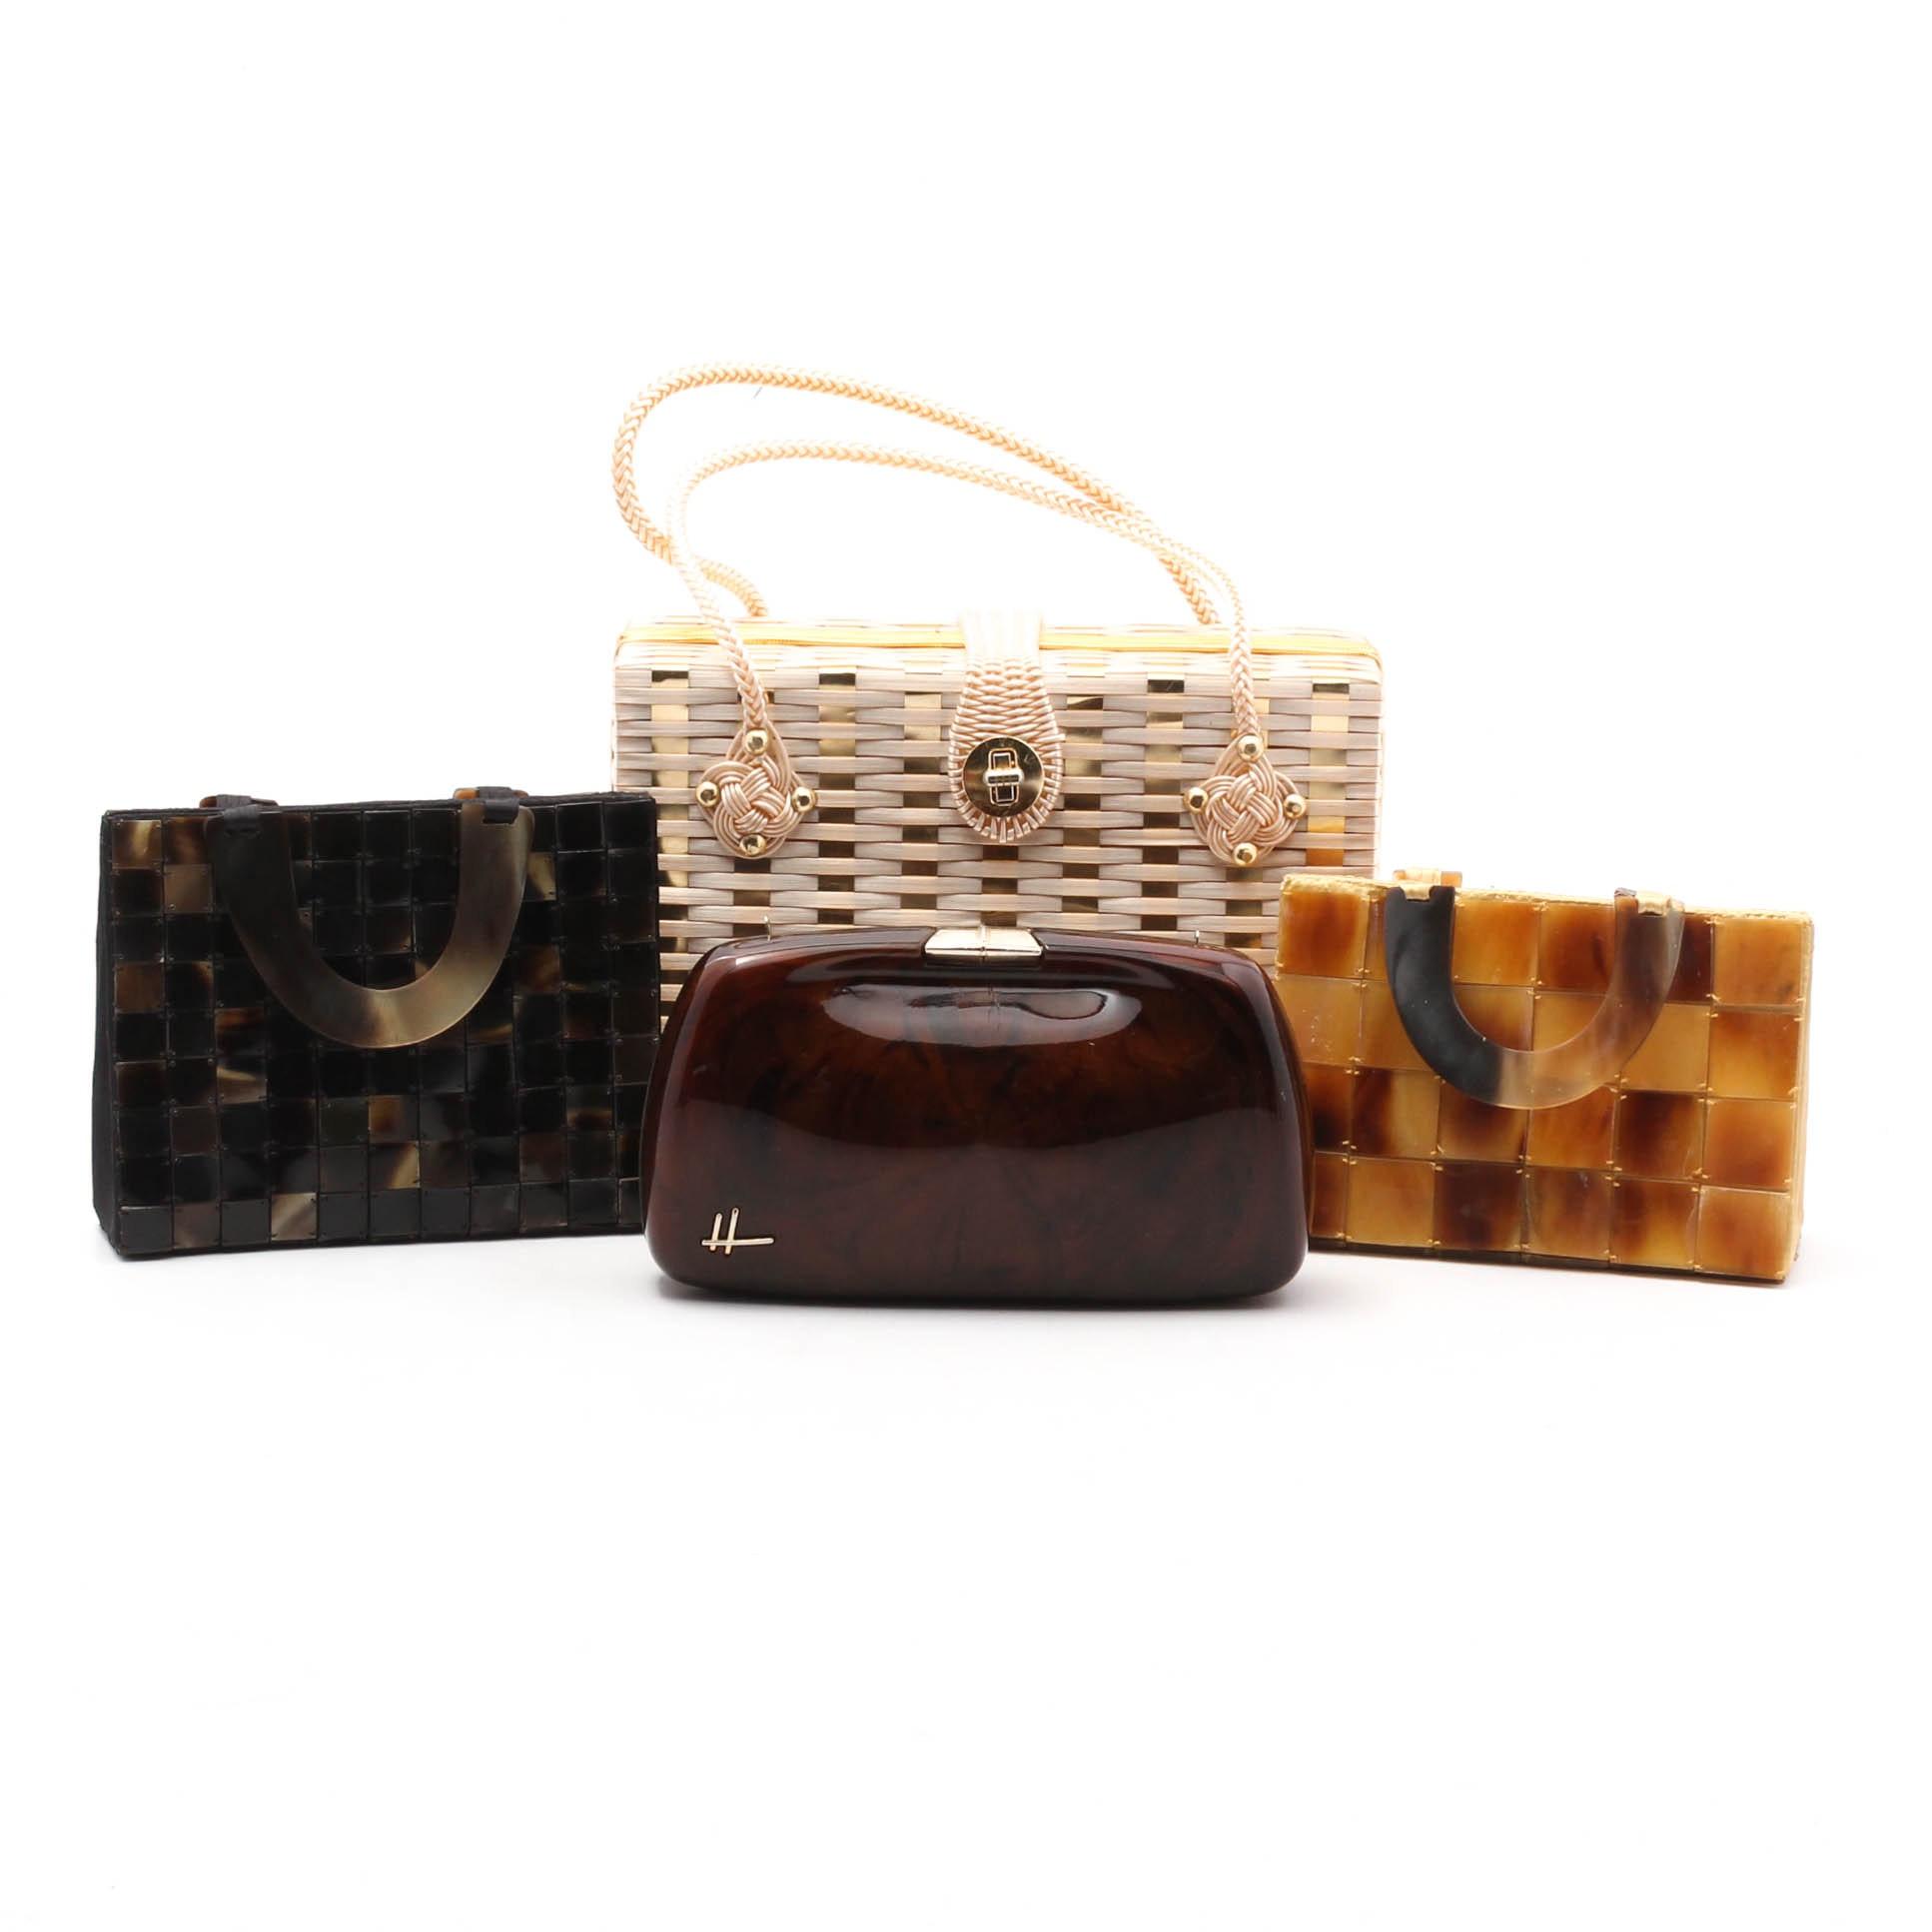 Four Vintage Handbags Including Woven Box Purse